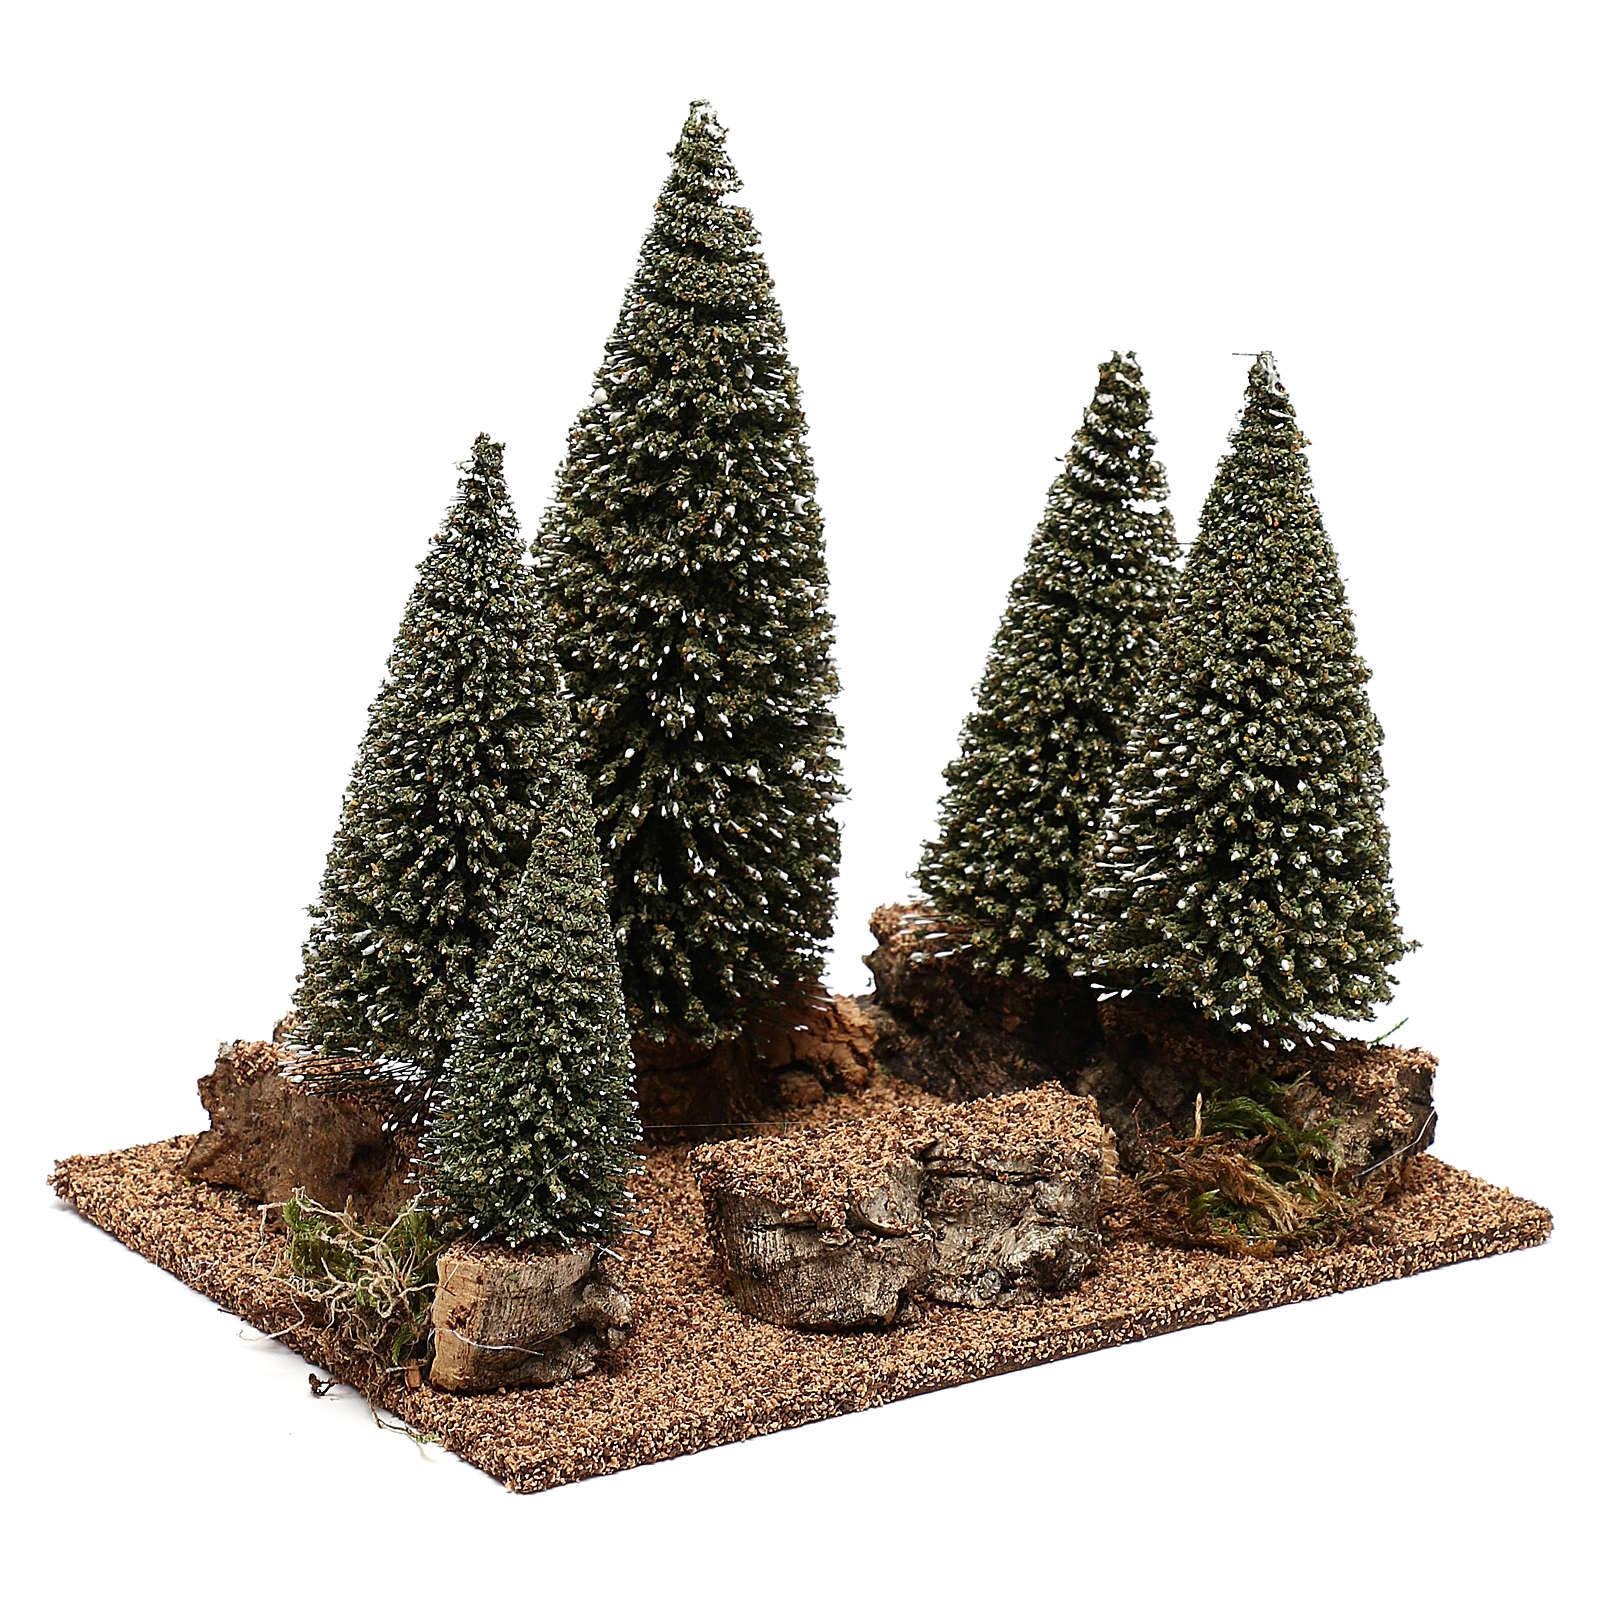 Bosque de pinos belén en estilo nórdico de 6 cm 4